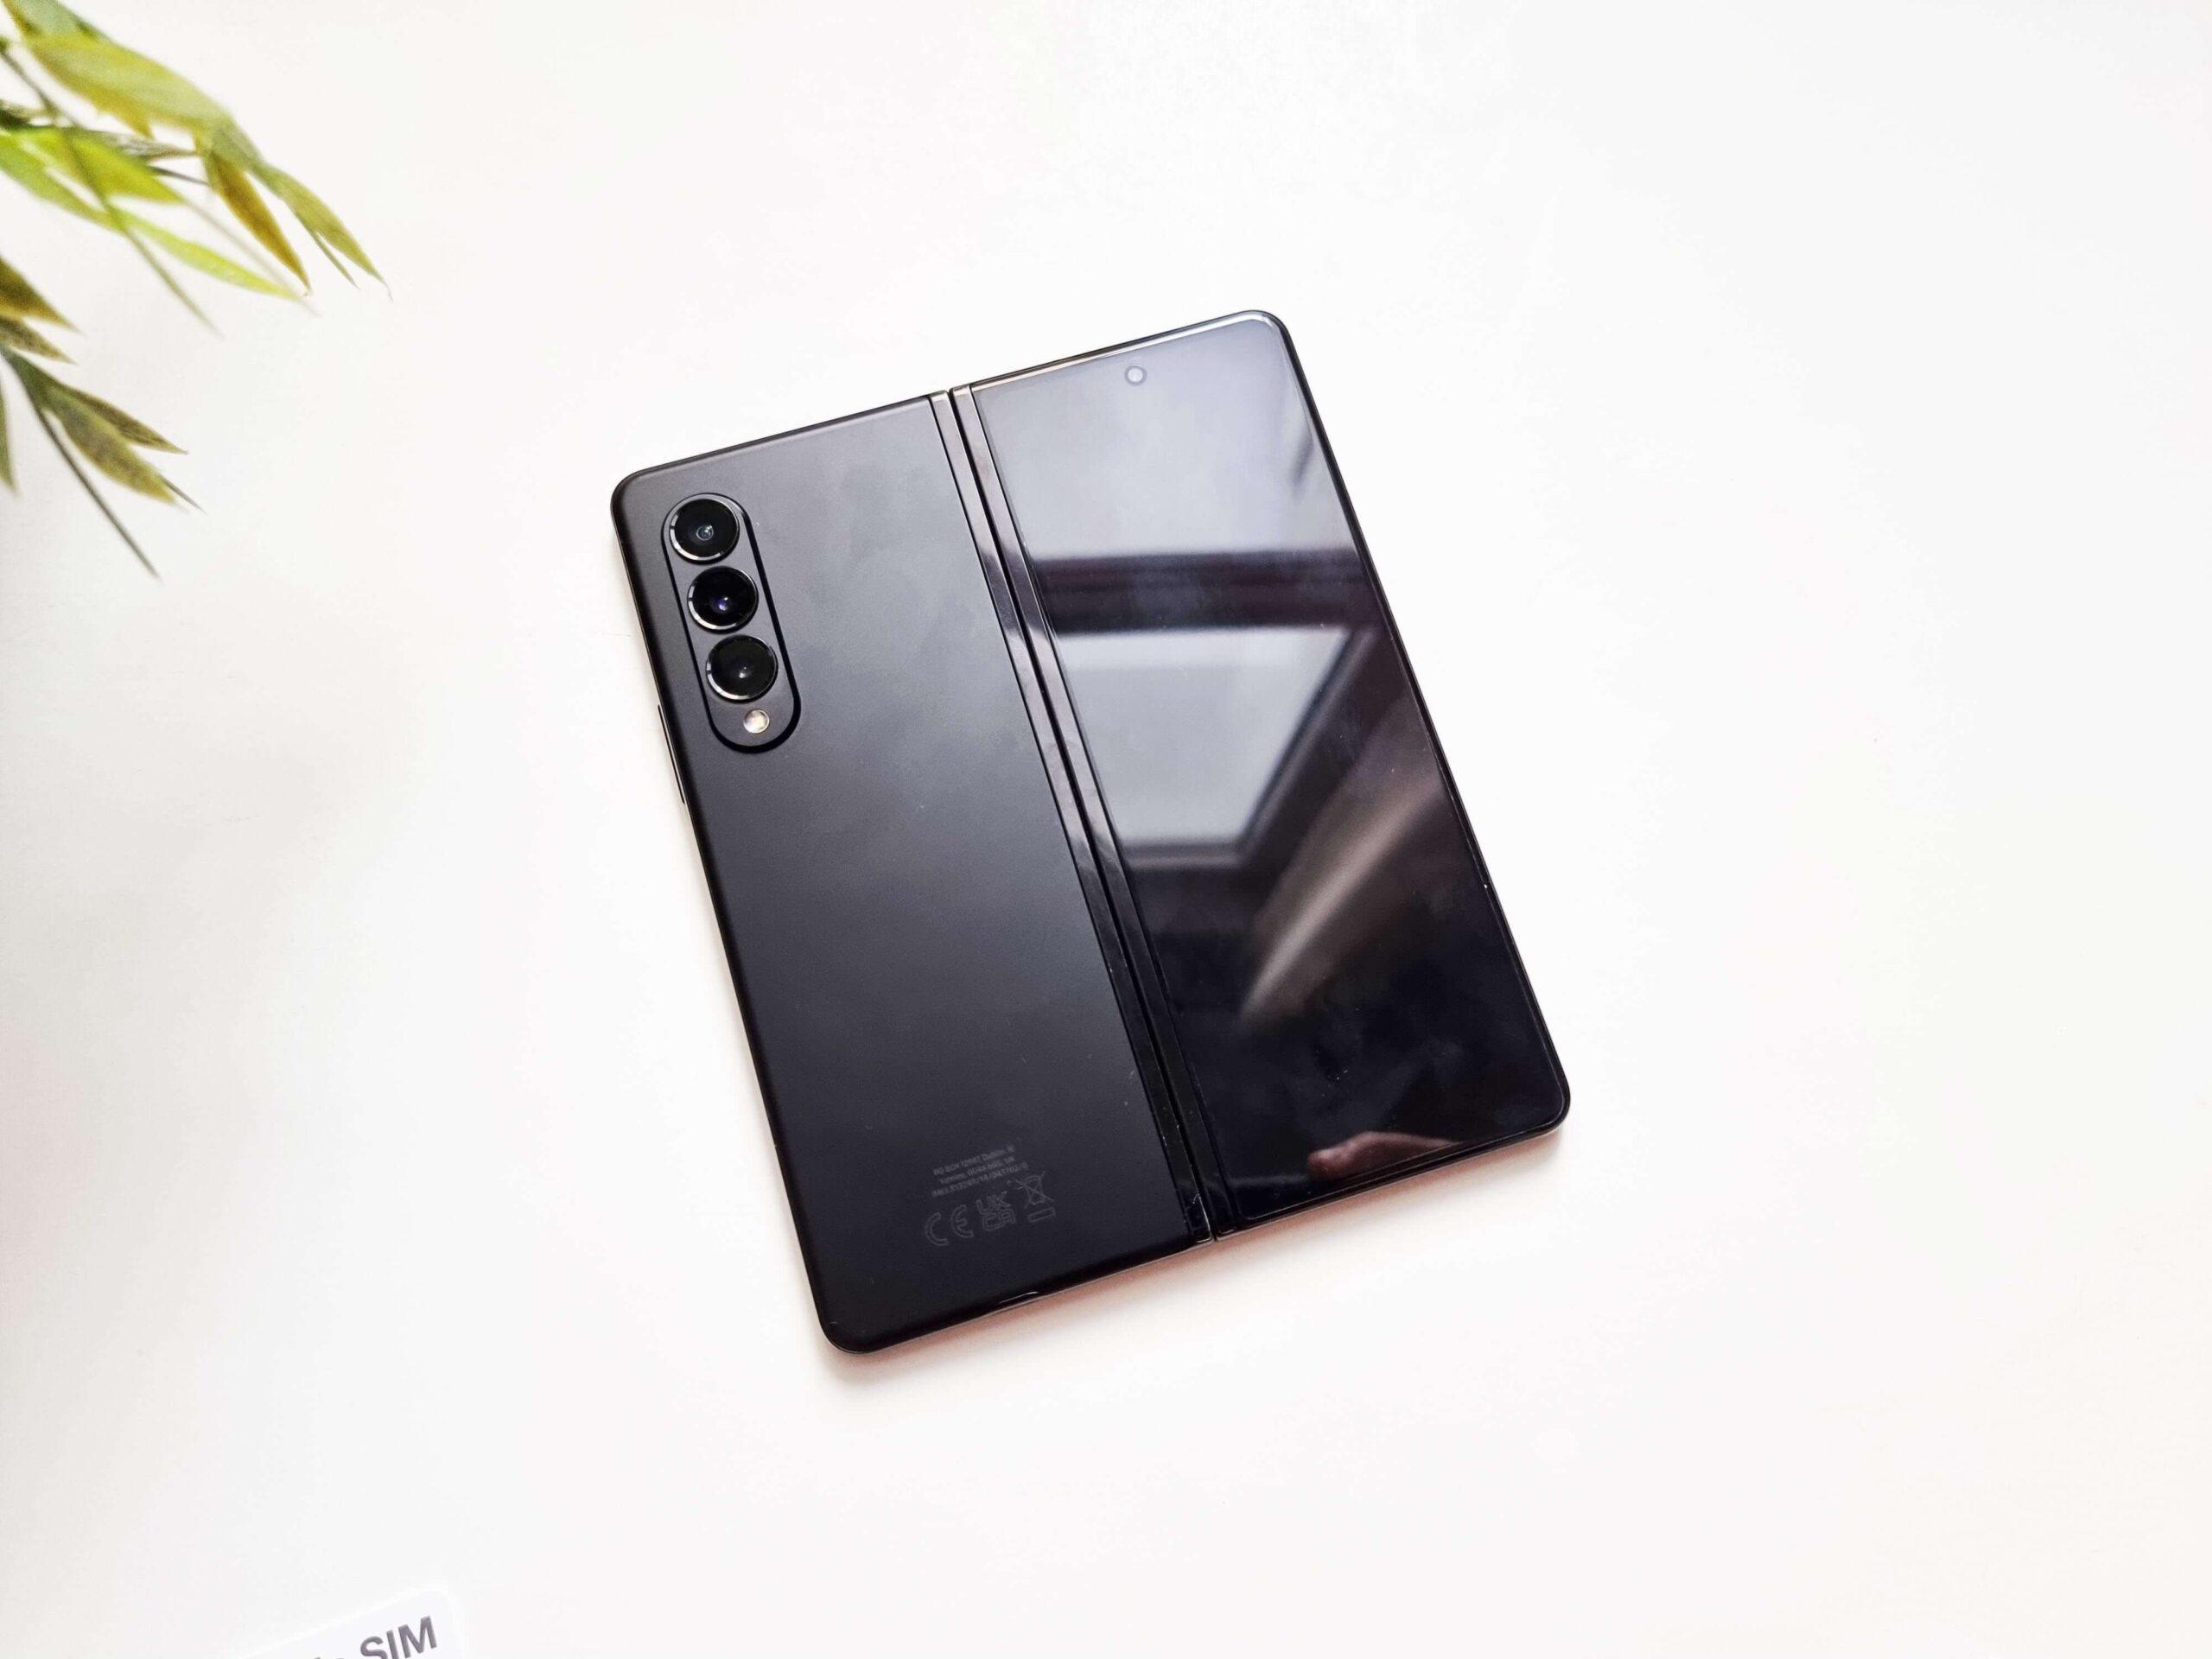 Tot ce trebuie sa stii despre telefoanele pliabile Samsung Galaxy Z Fold3 si Z Flip3 - 4